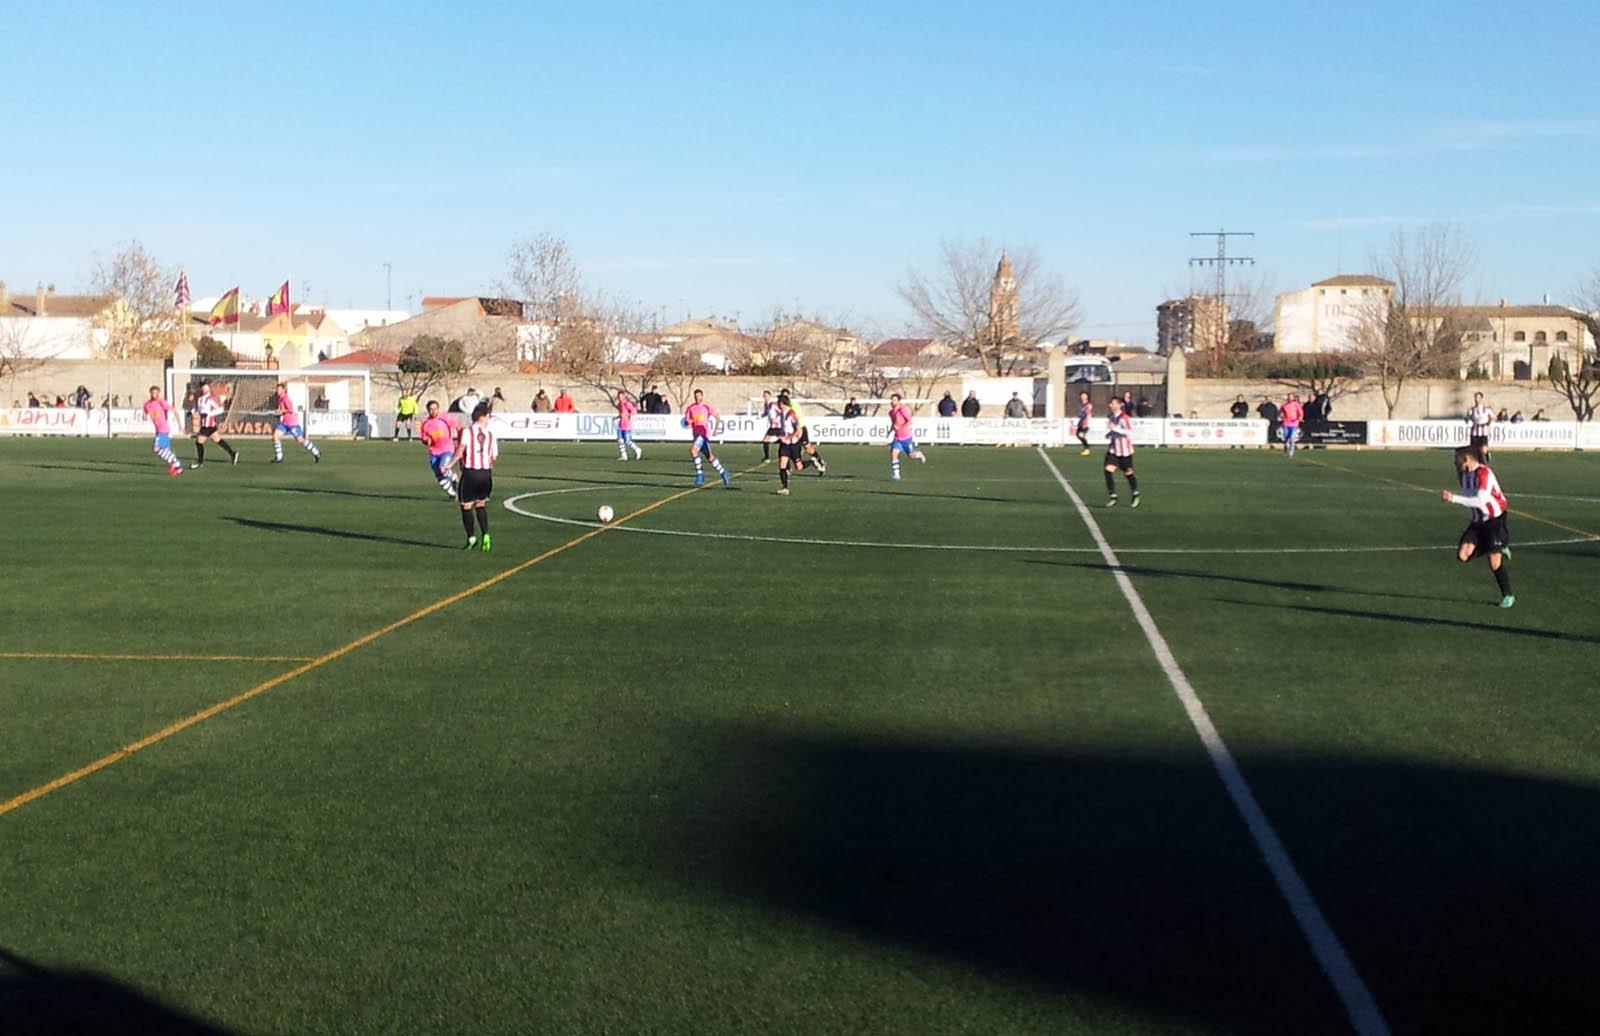 Atlético Ibañés - Formac Villarrubia CF